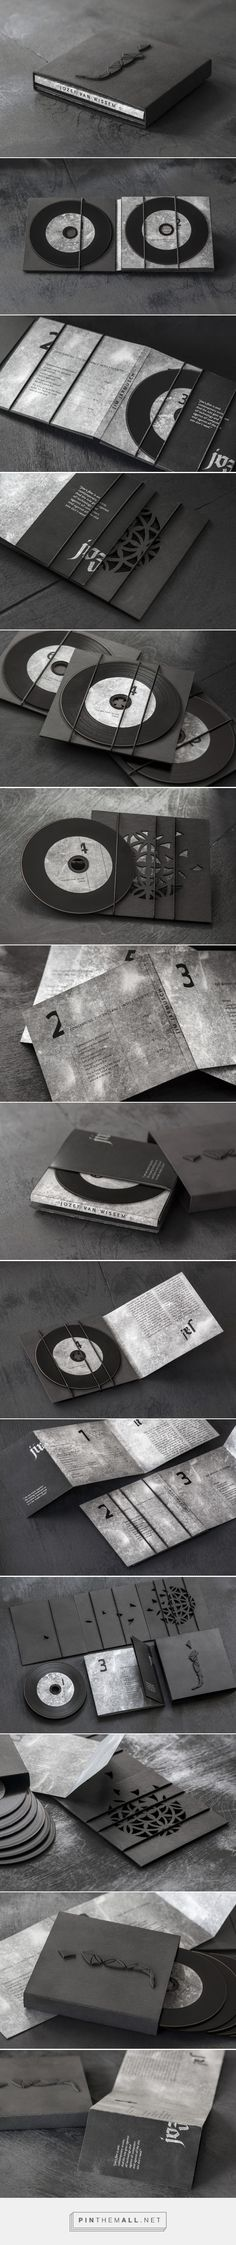 Jozef Van Wissem & Jim Jarmusch Box Set (Student Project) on Packaging of the World - Creative Package Design Gallery  - http://www.packagingoftheworld.com/2015/03/jozef-van-wissem-jim-jarmusch-box-set.html